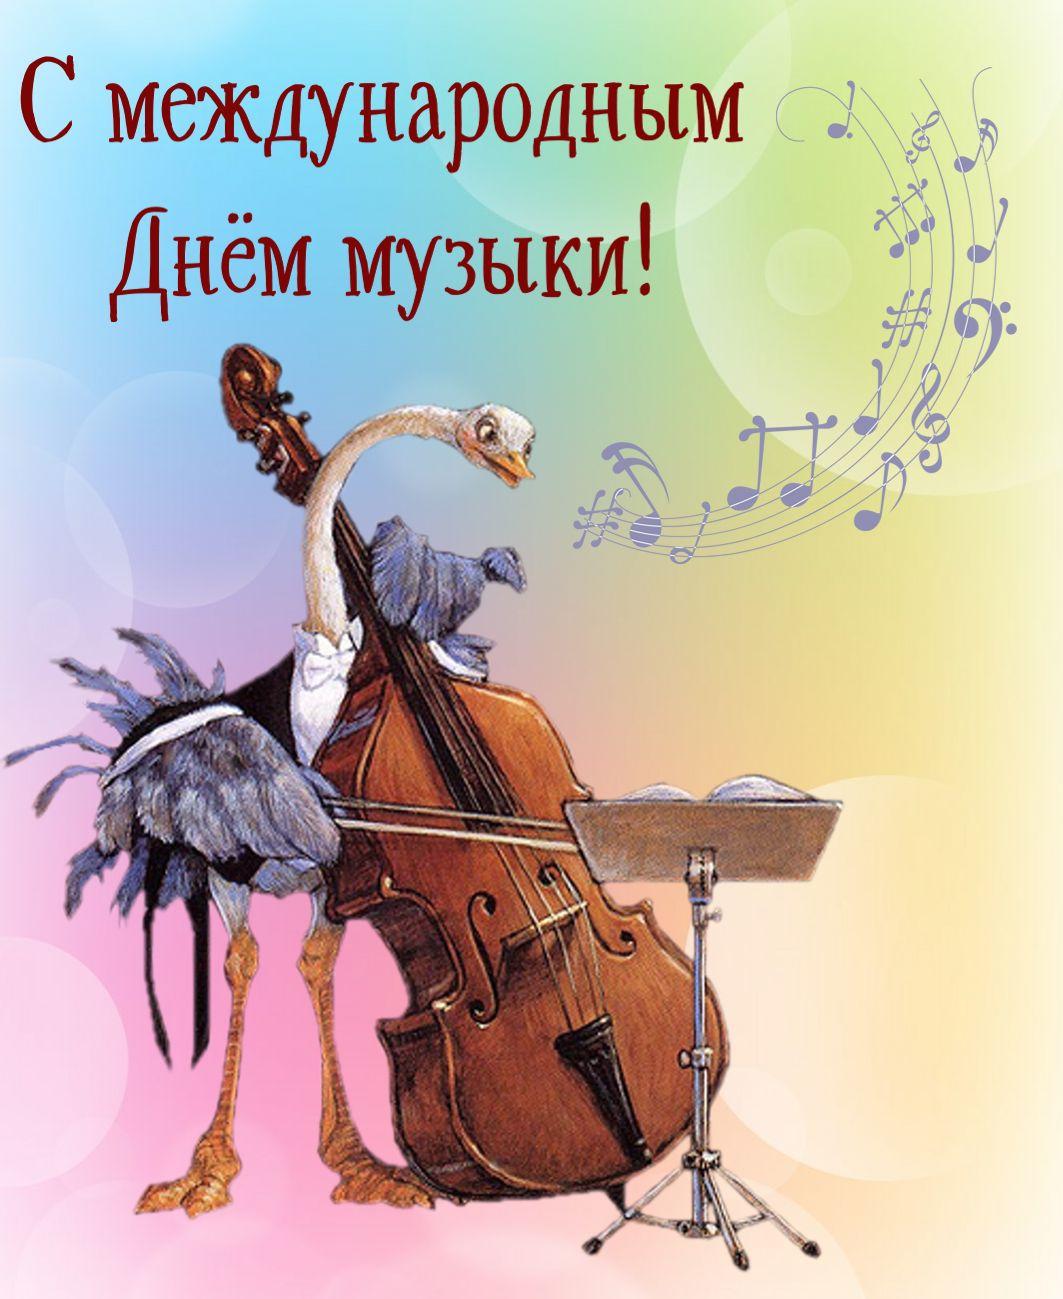 открытка с днем музыки - страус играющий на контрабасе